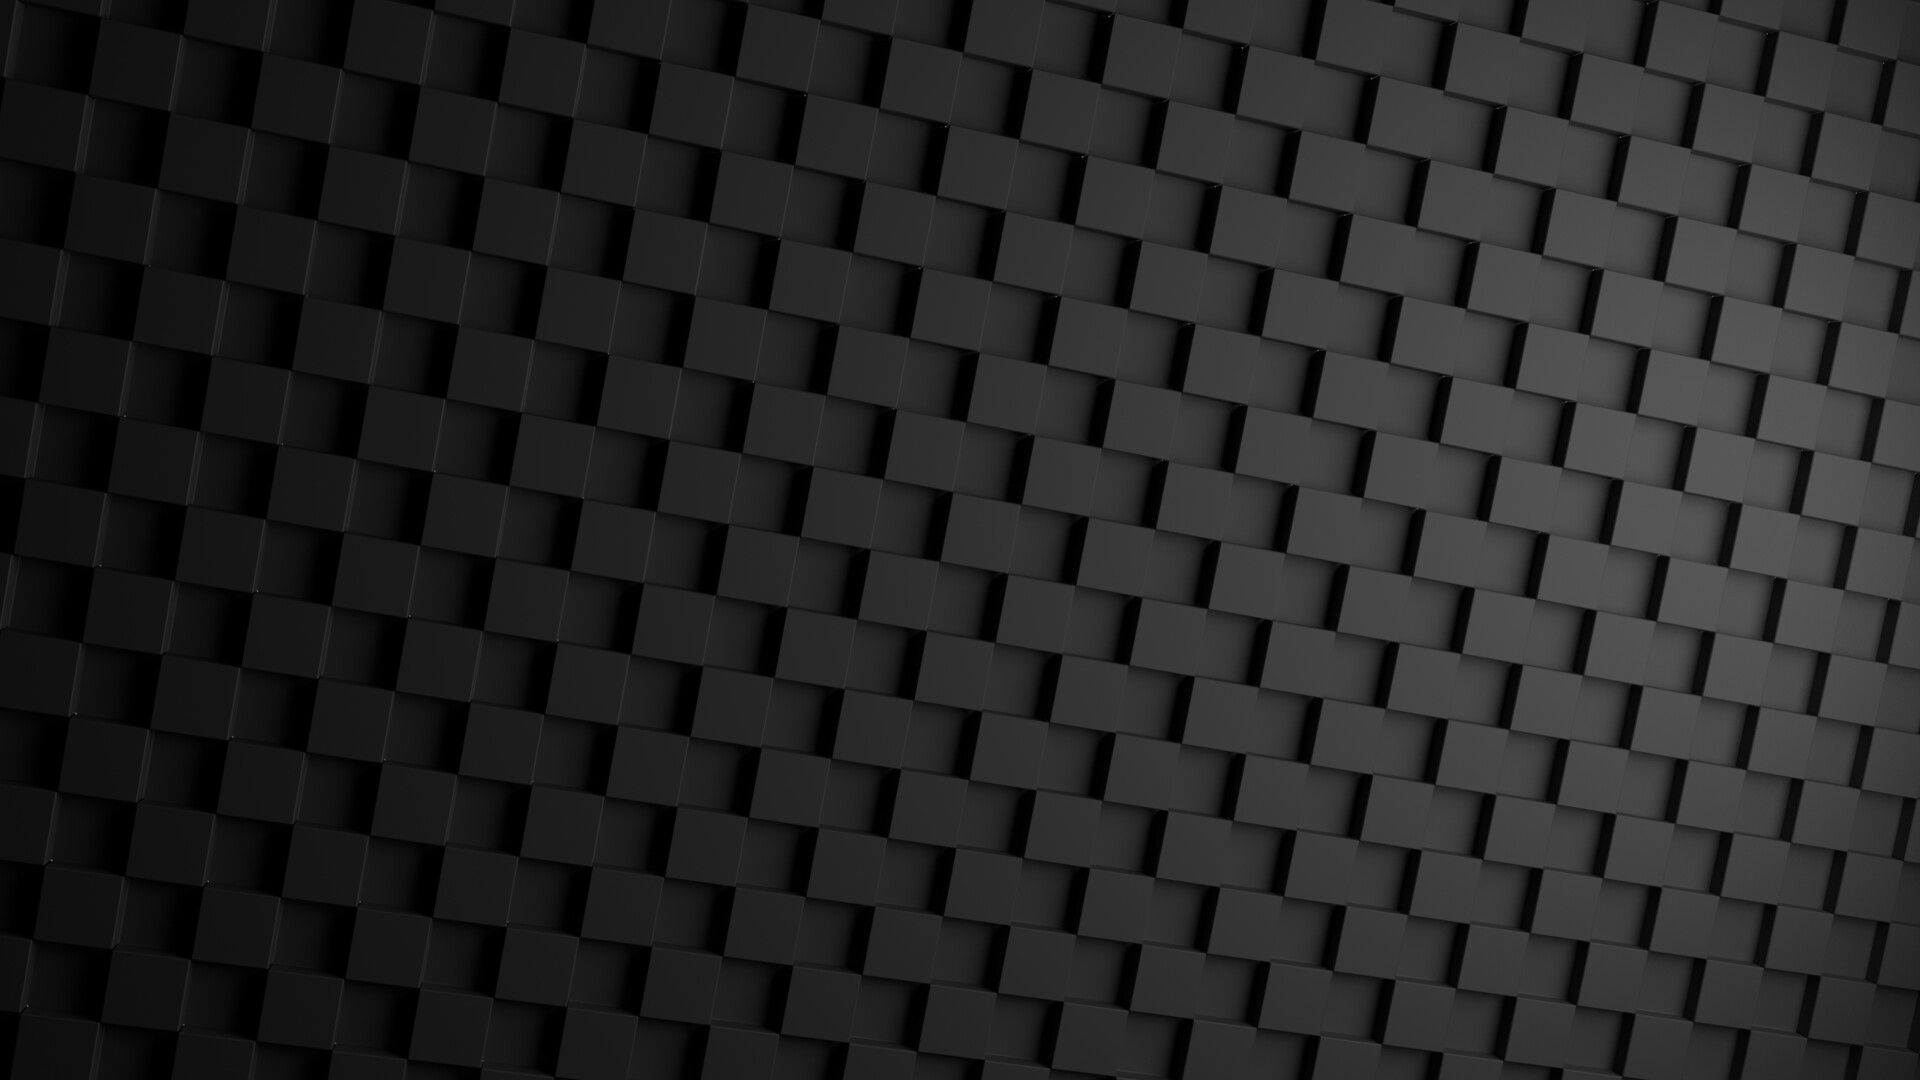 Plain Black wallpaper photo full hd